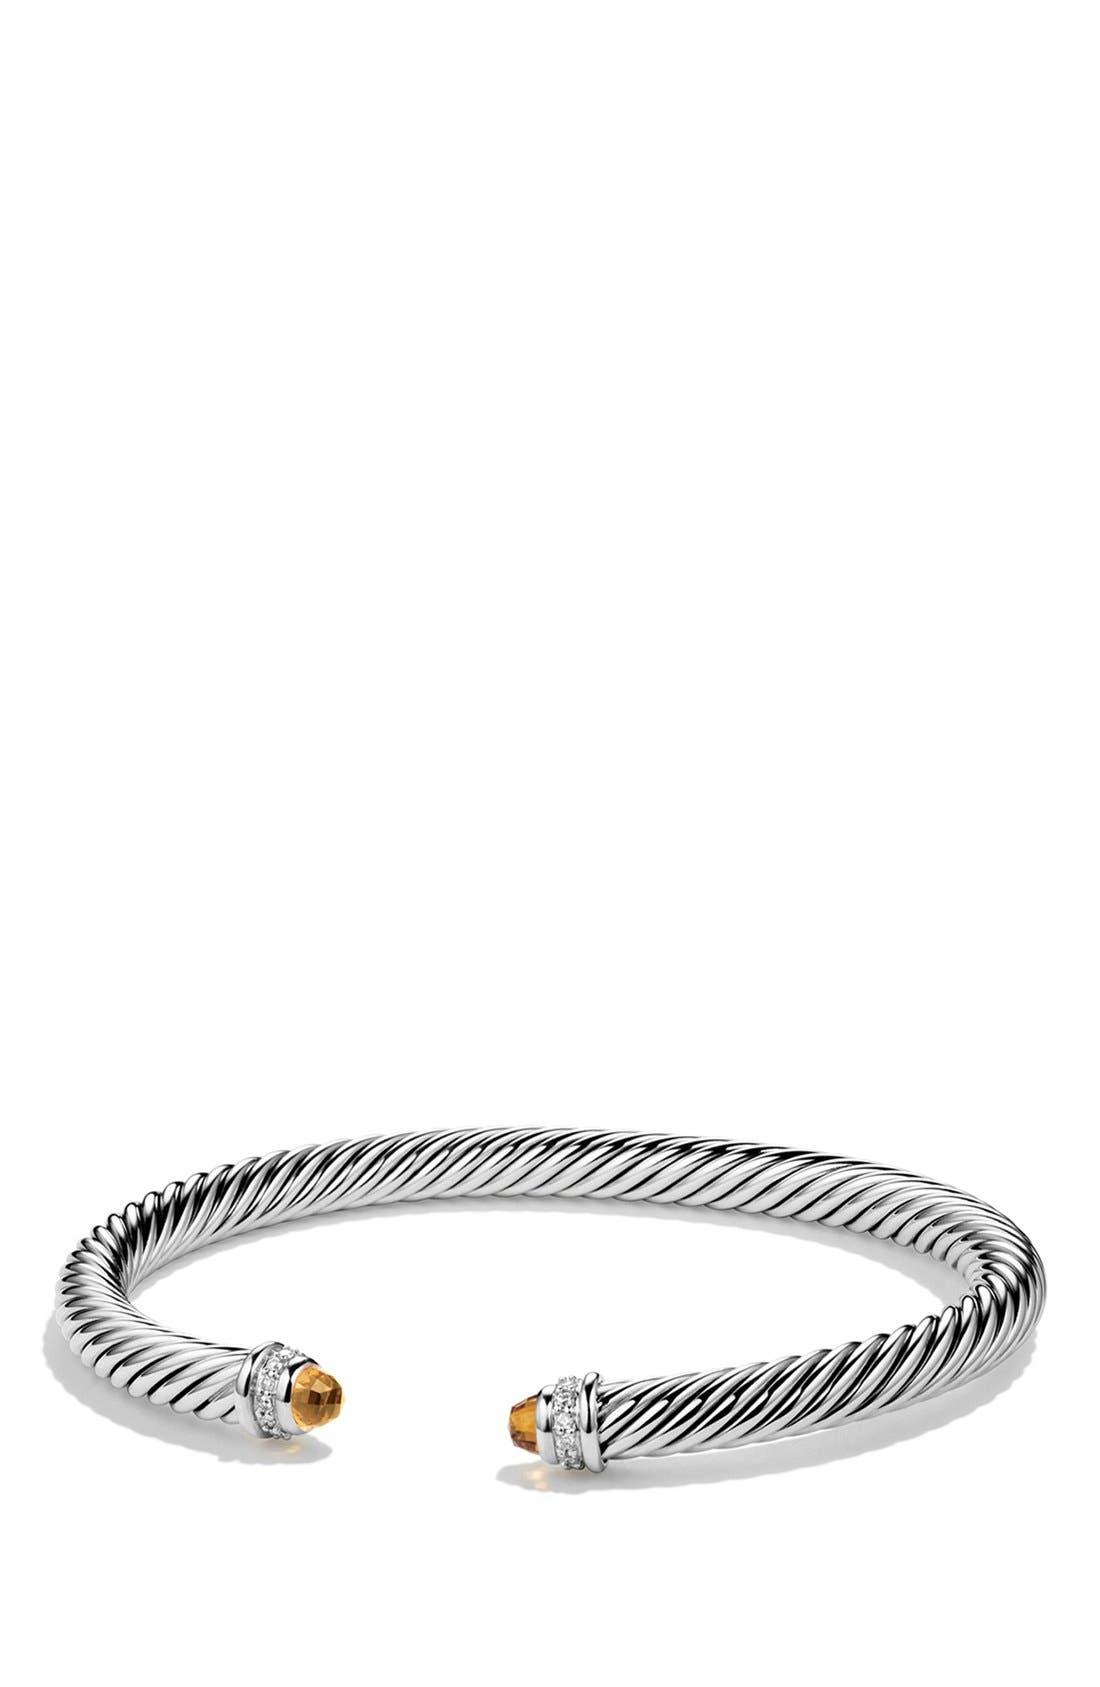 David Yurman 'Cable Classics' Bracelet with Semiprecious Stones & Diamonds